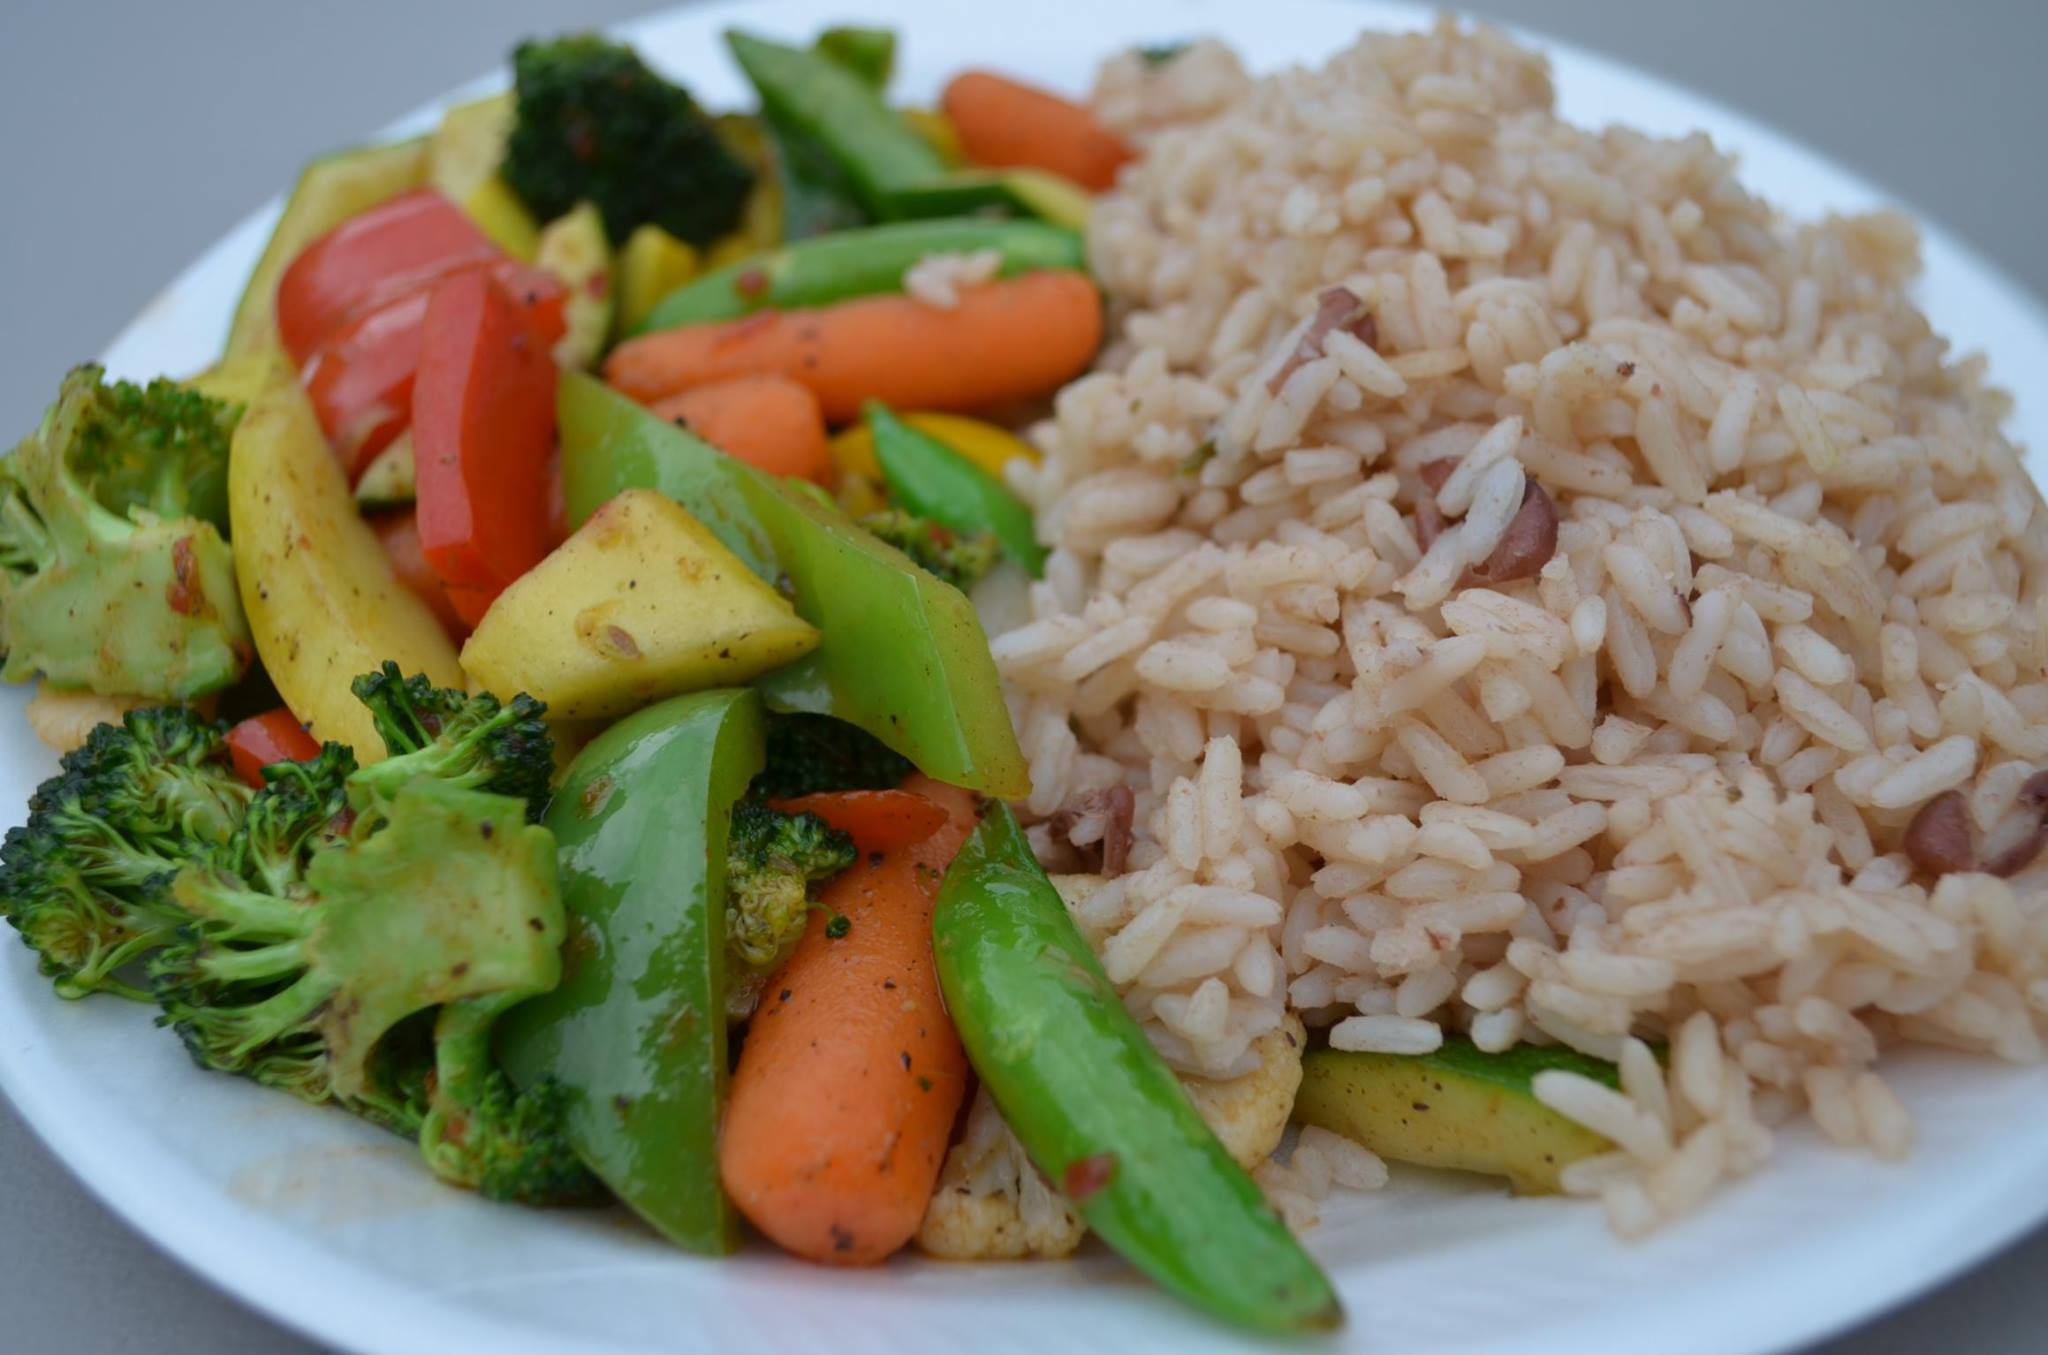 Fresh Veggie Plate.jpg